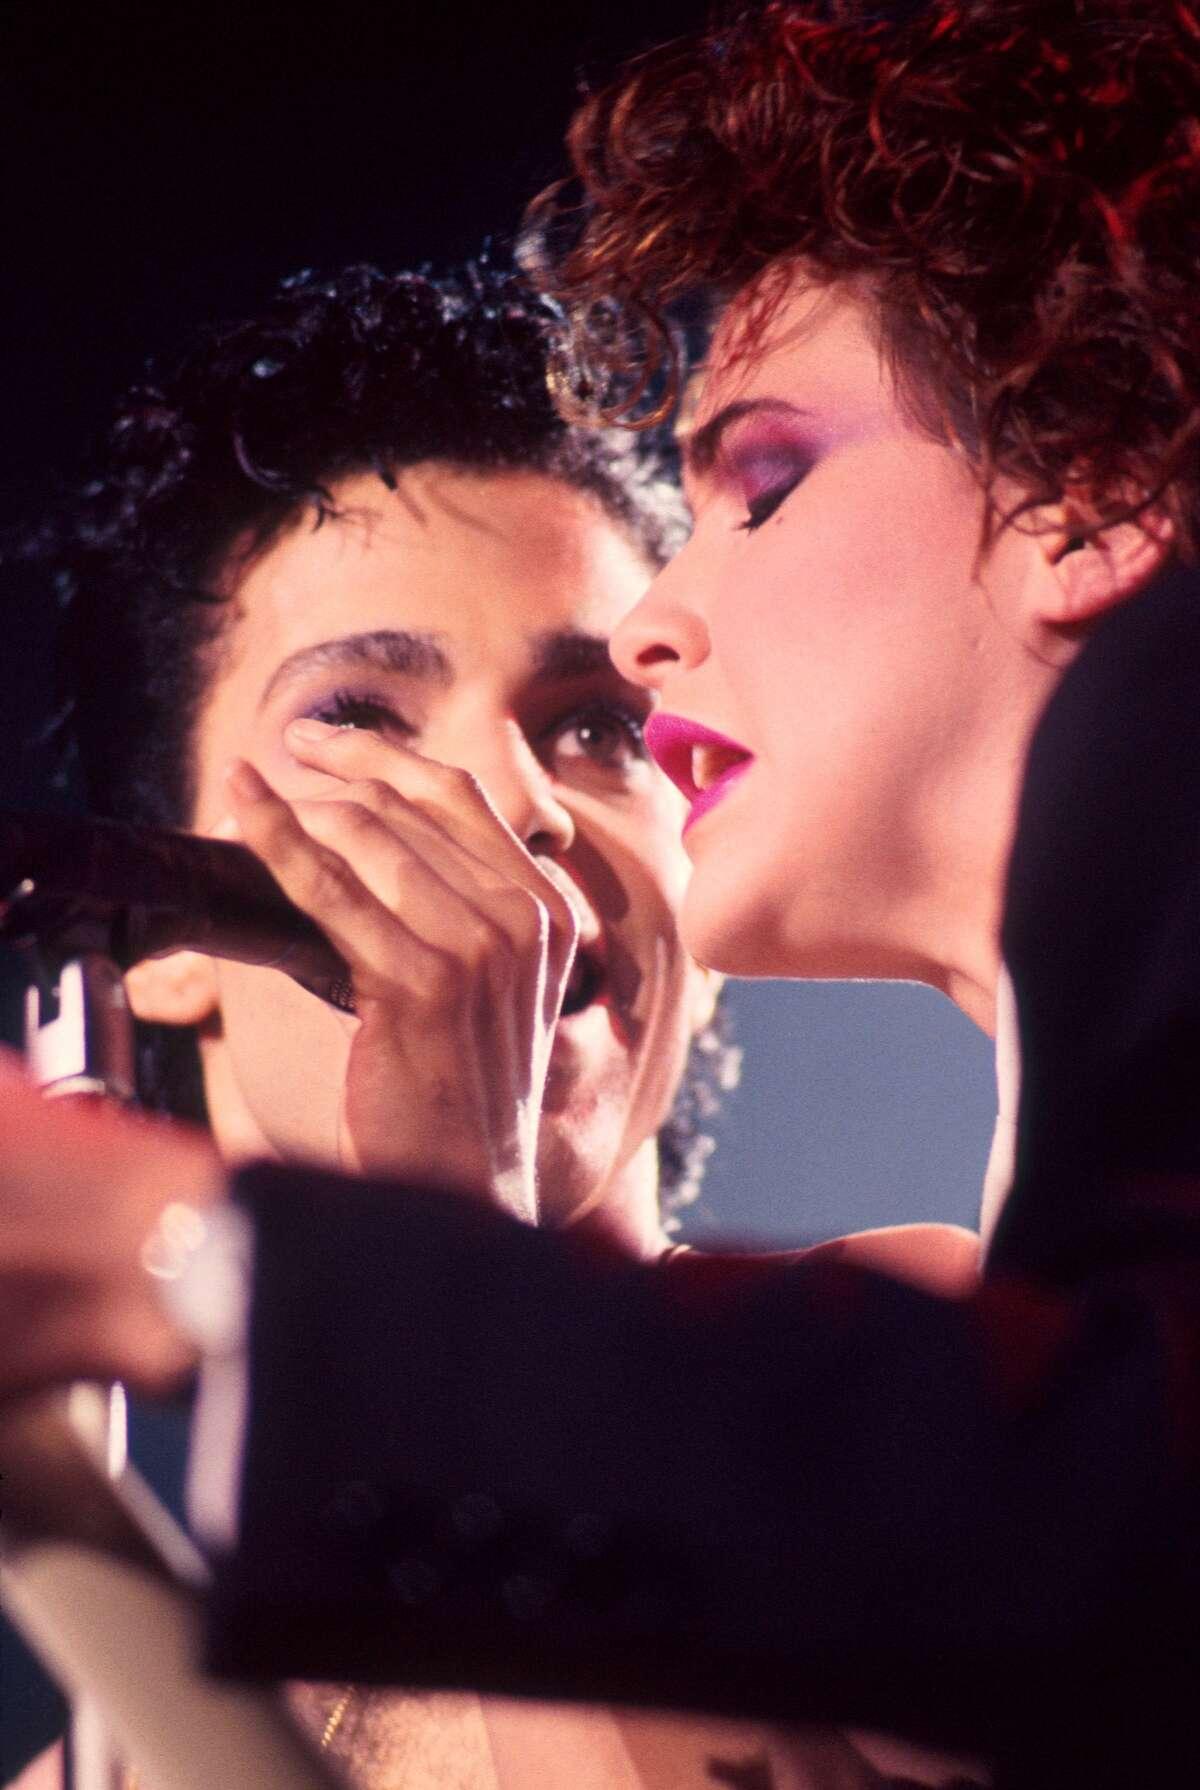 Prince and Sheena Easton perform on stage, London, 1986.